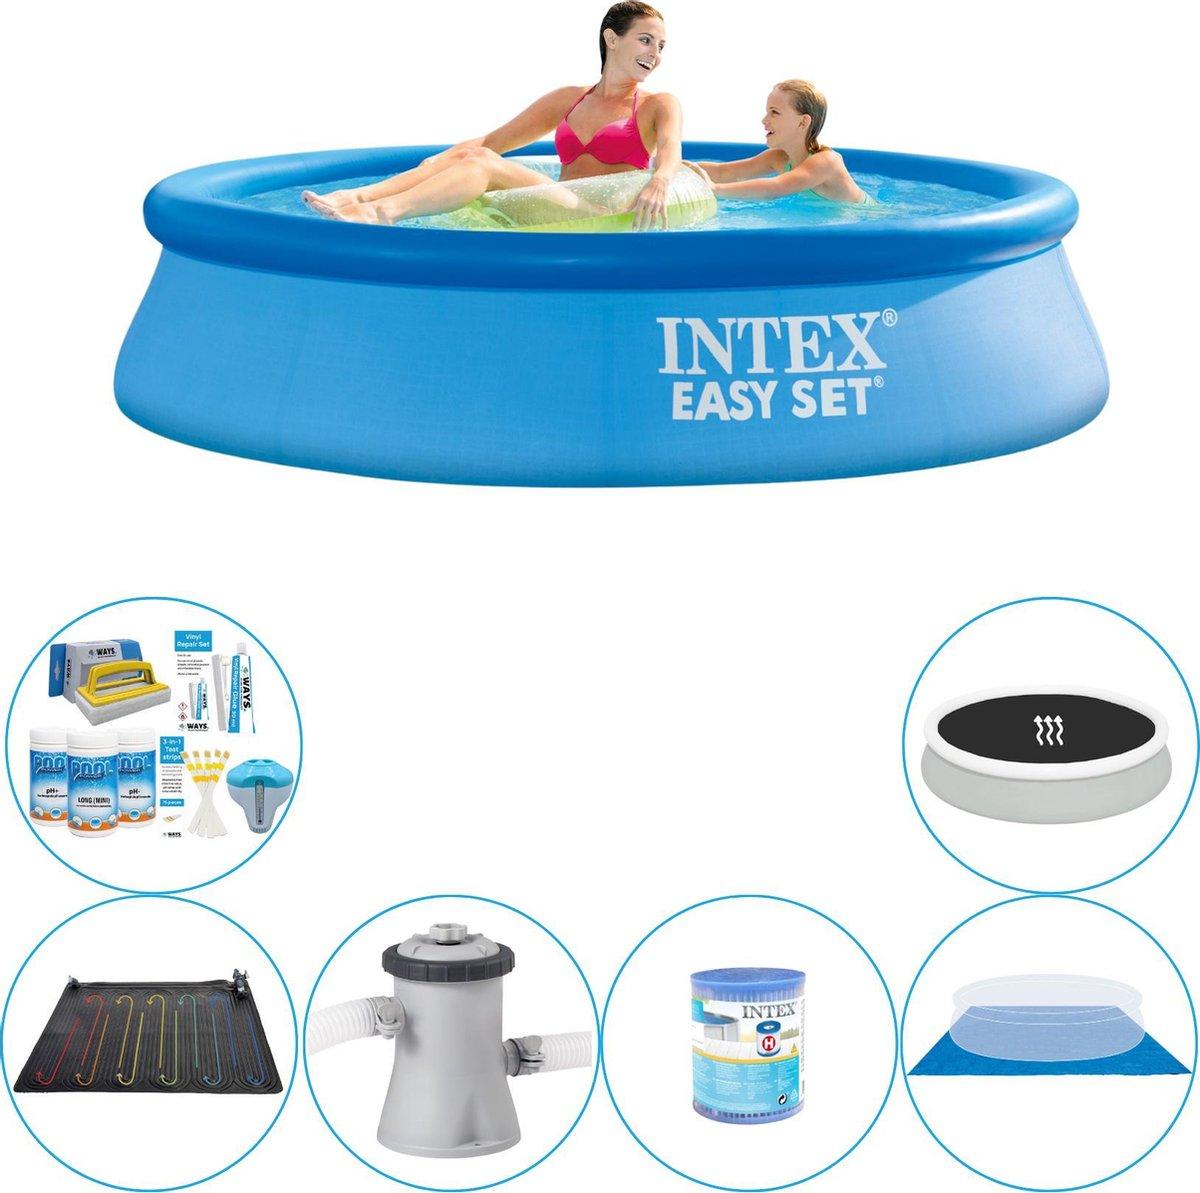 Intex Easy Set Rond 244x61 cm - Slimme Zwembad Deal